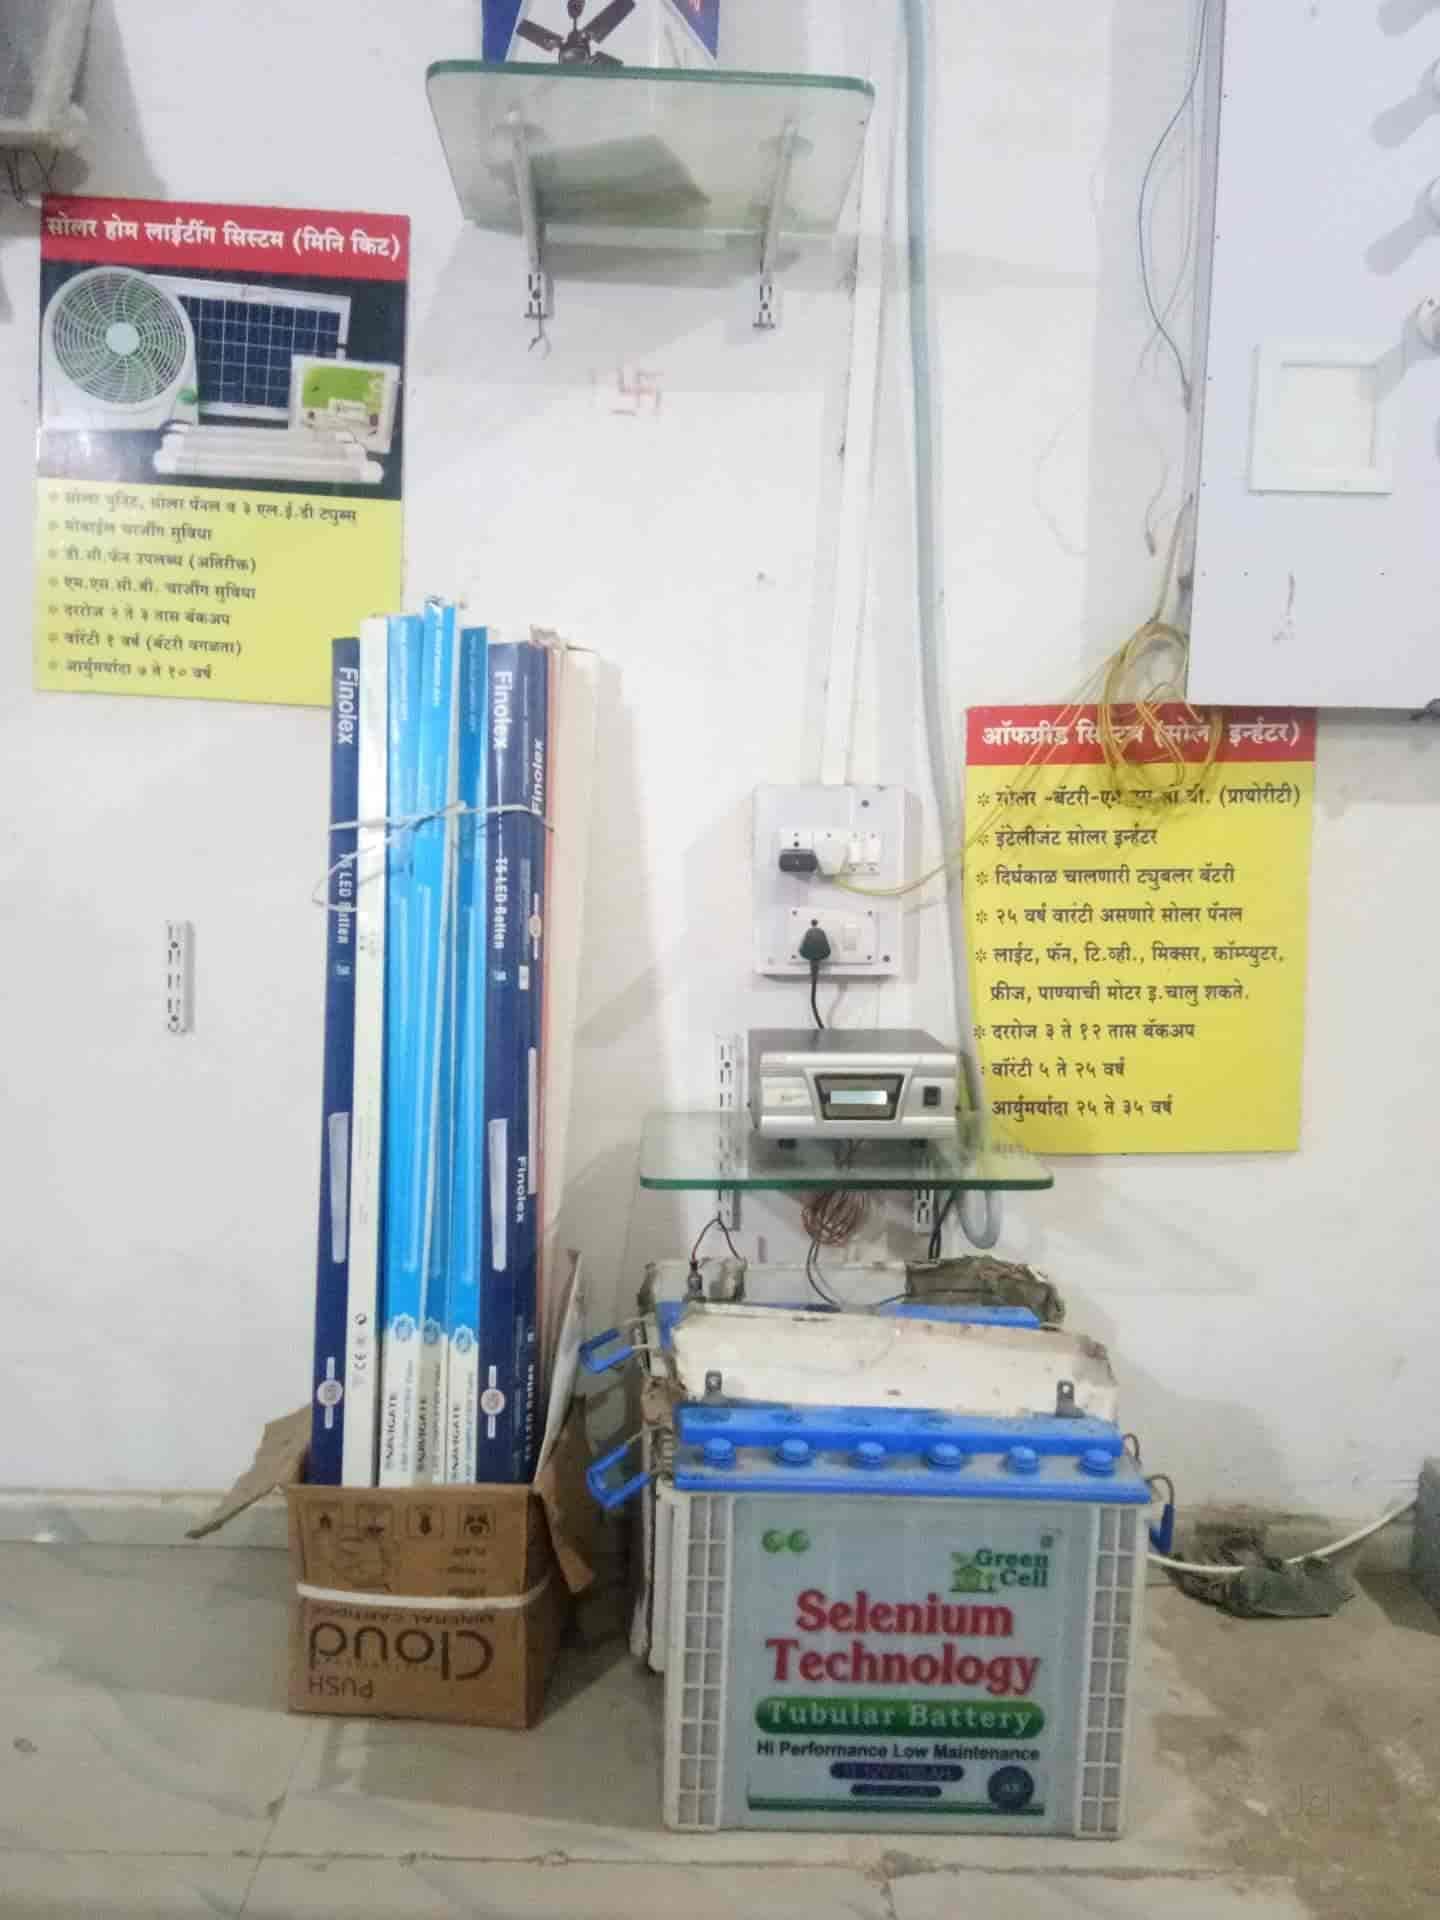 Samruddhi Solar And Electrical Photos, Deola, Nashik- Pictures